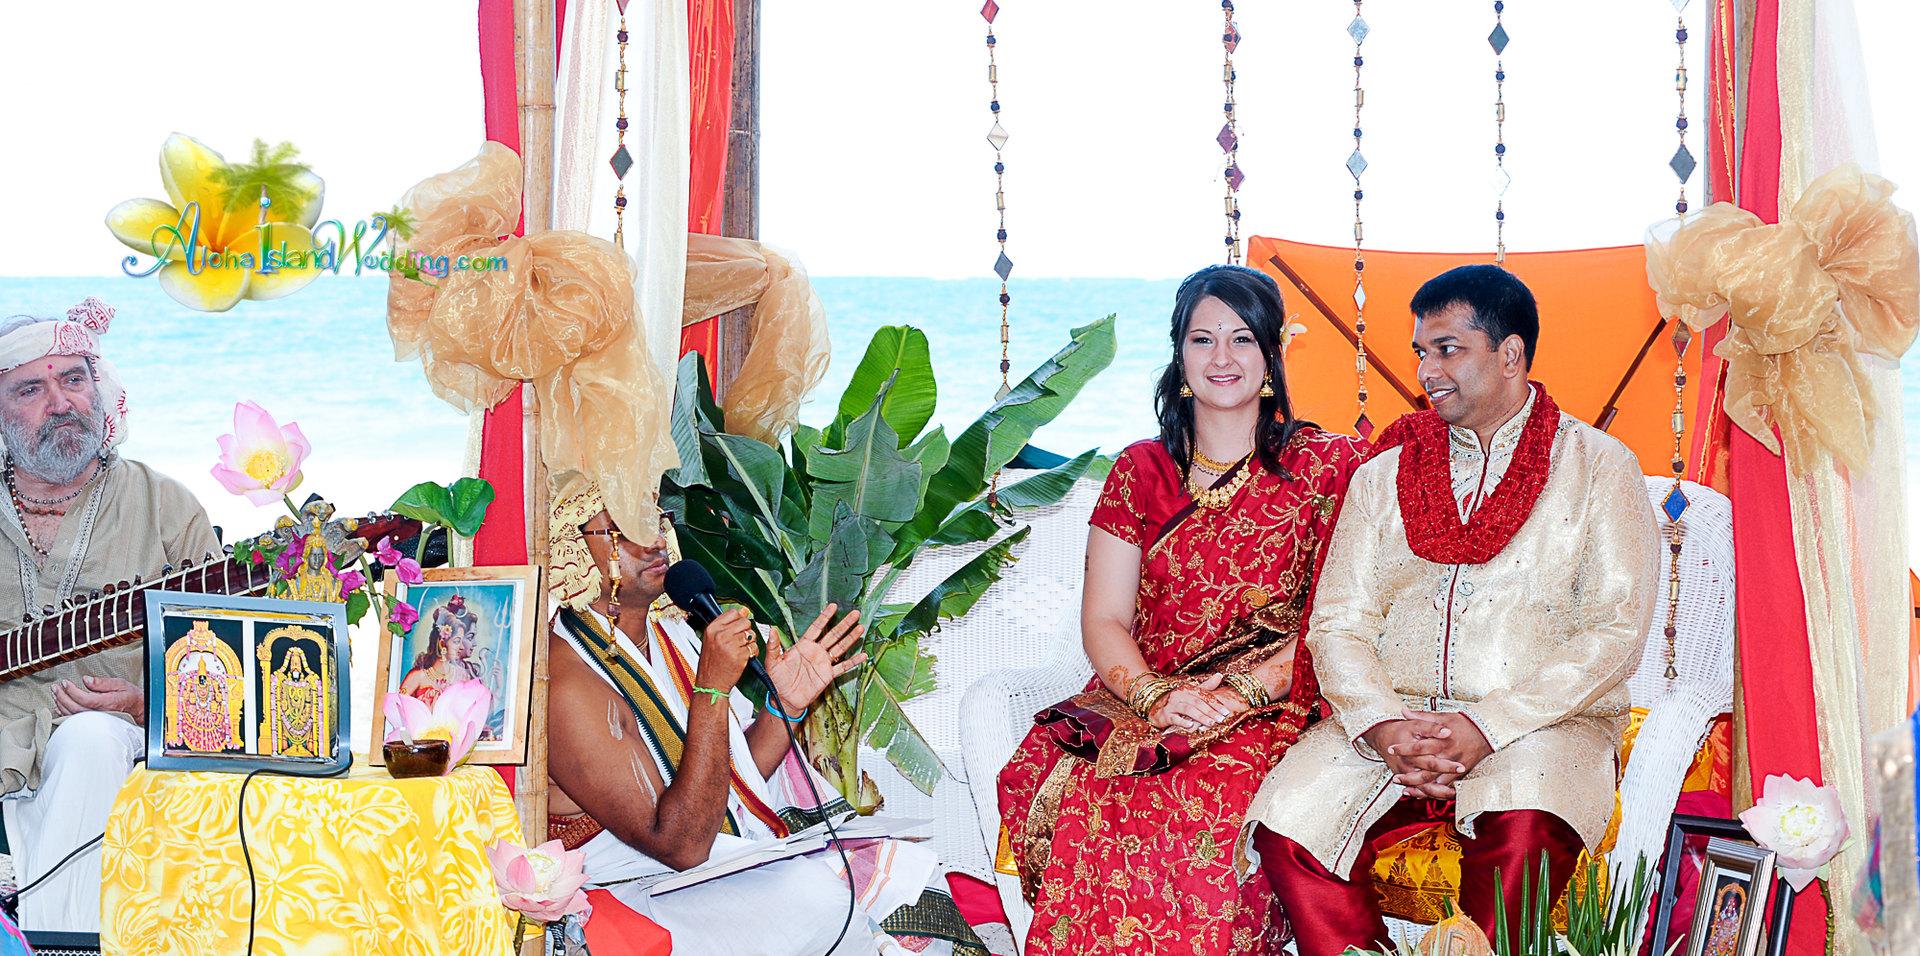 Indian wedding ceremony in hawaii-55.jpg